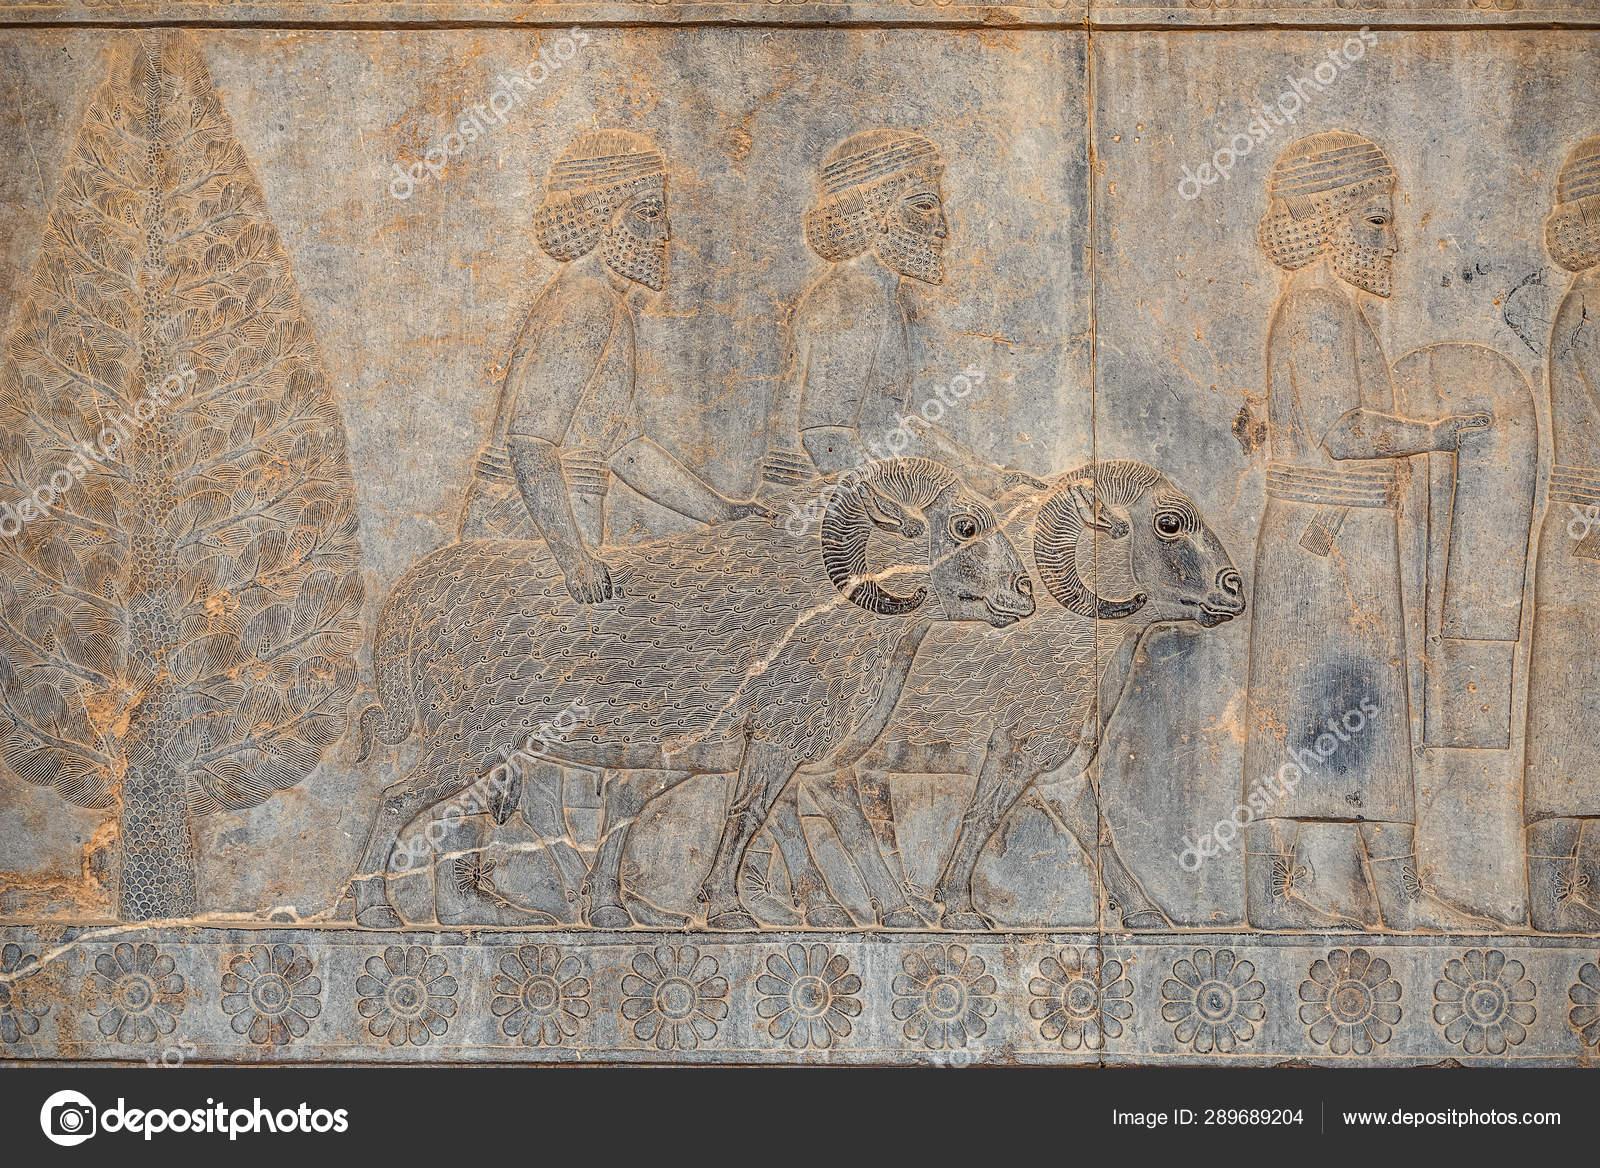 Ancien Inscriptions Walls Persepolis Ancient Capital Old Persian Achaemenid Empire Stock Photo C Leshiy985 289689204